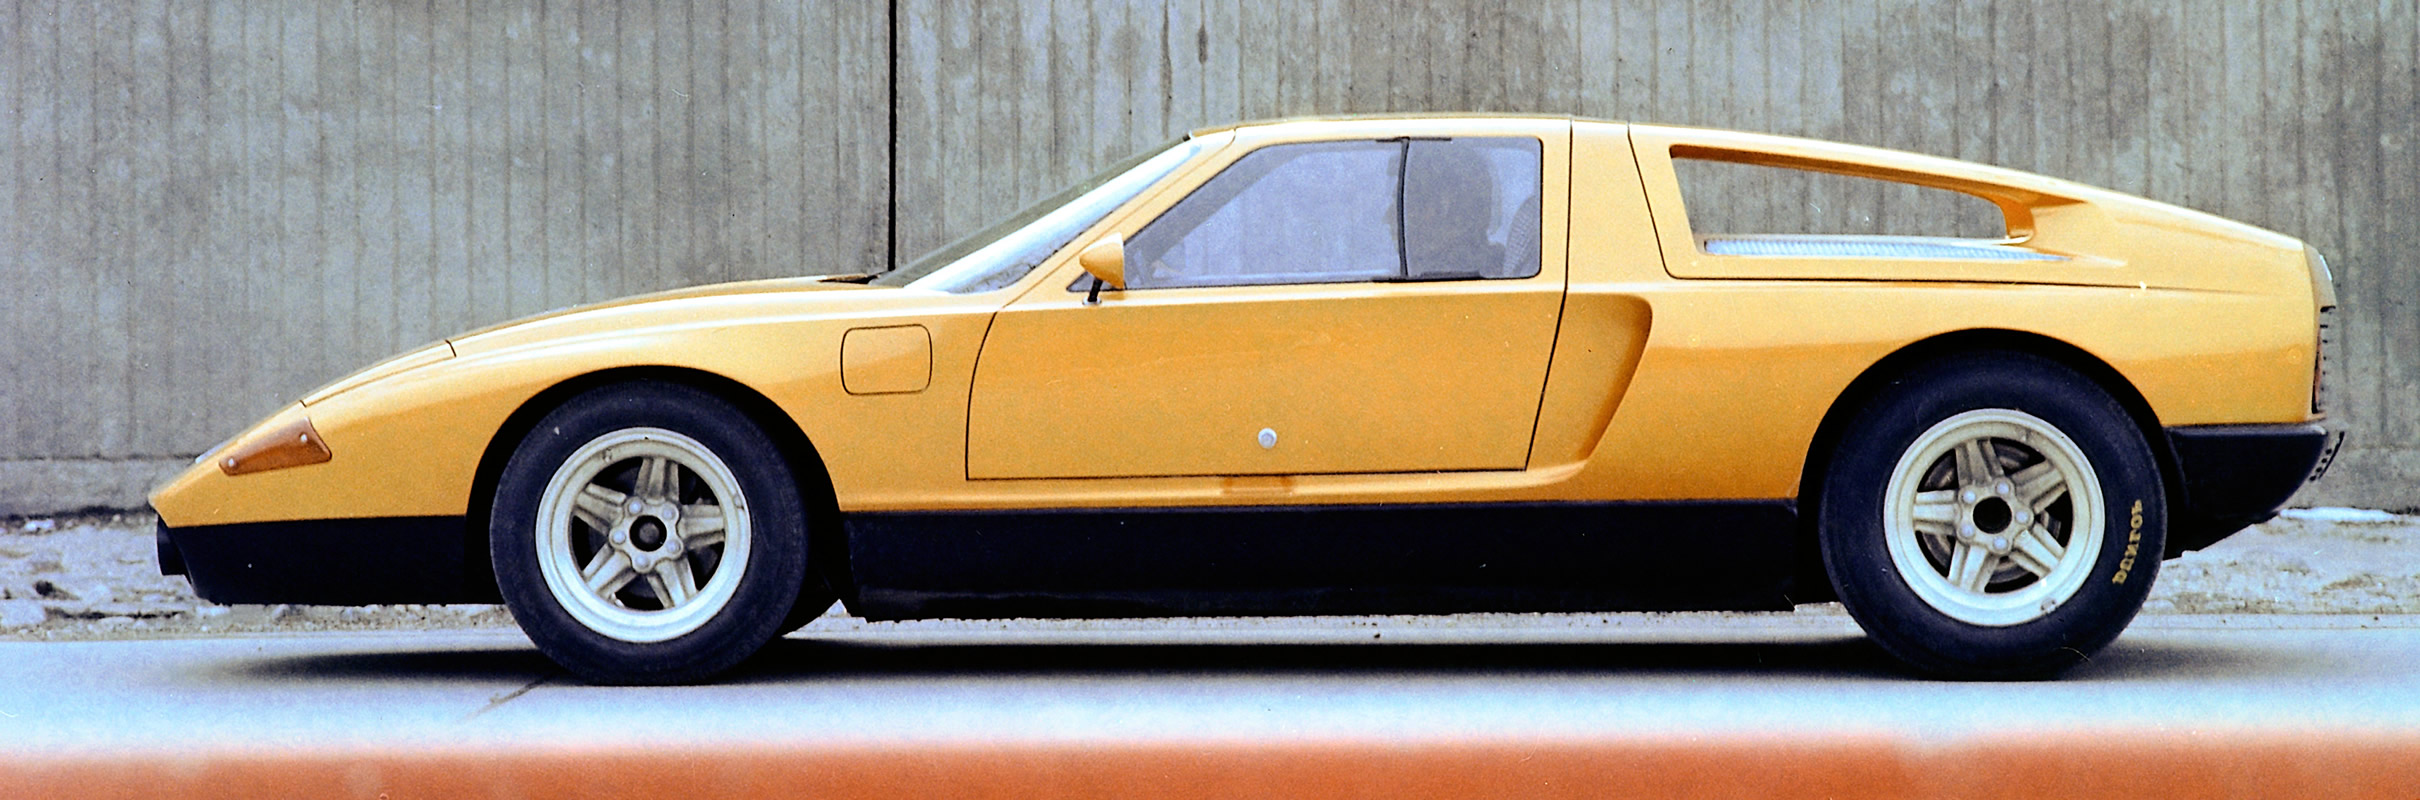 02. 1970 Mercedes-Benz C111-II